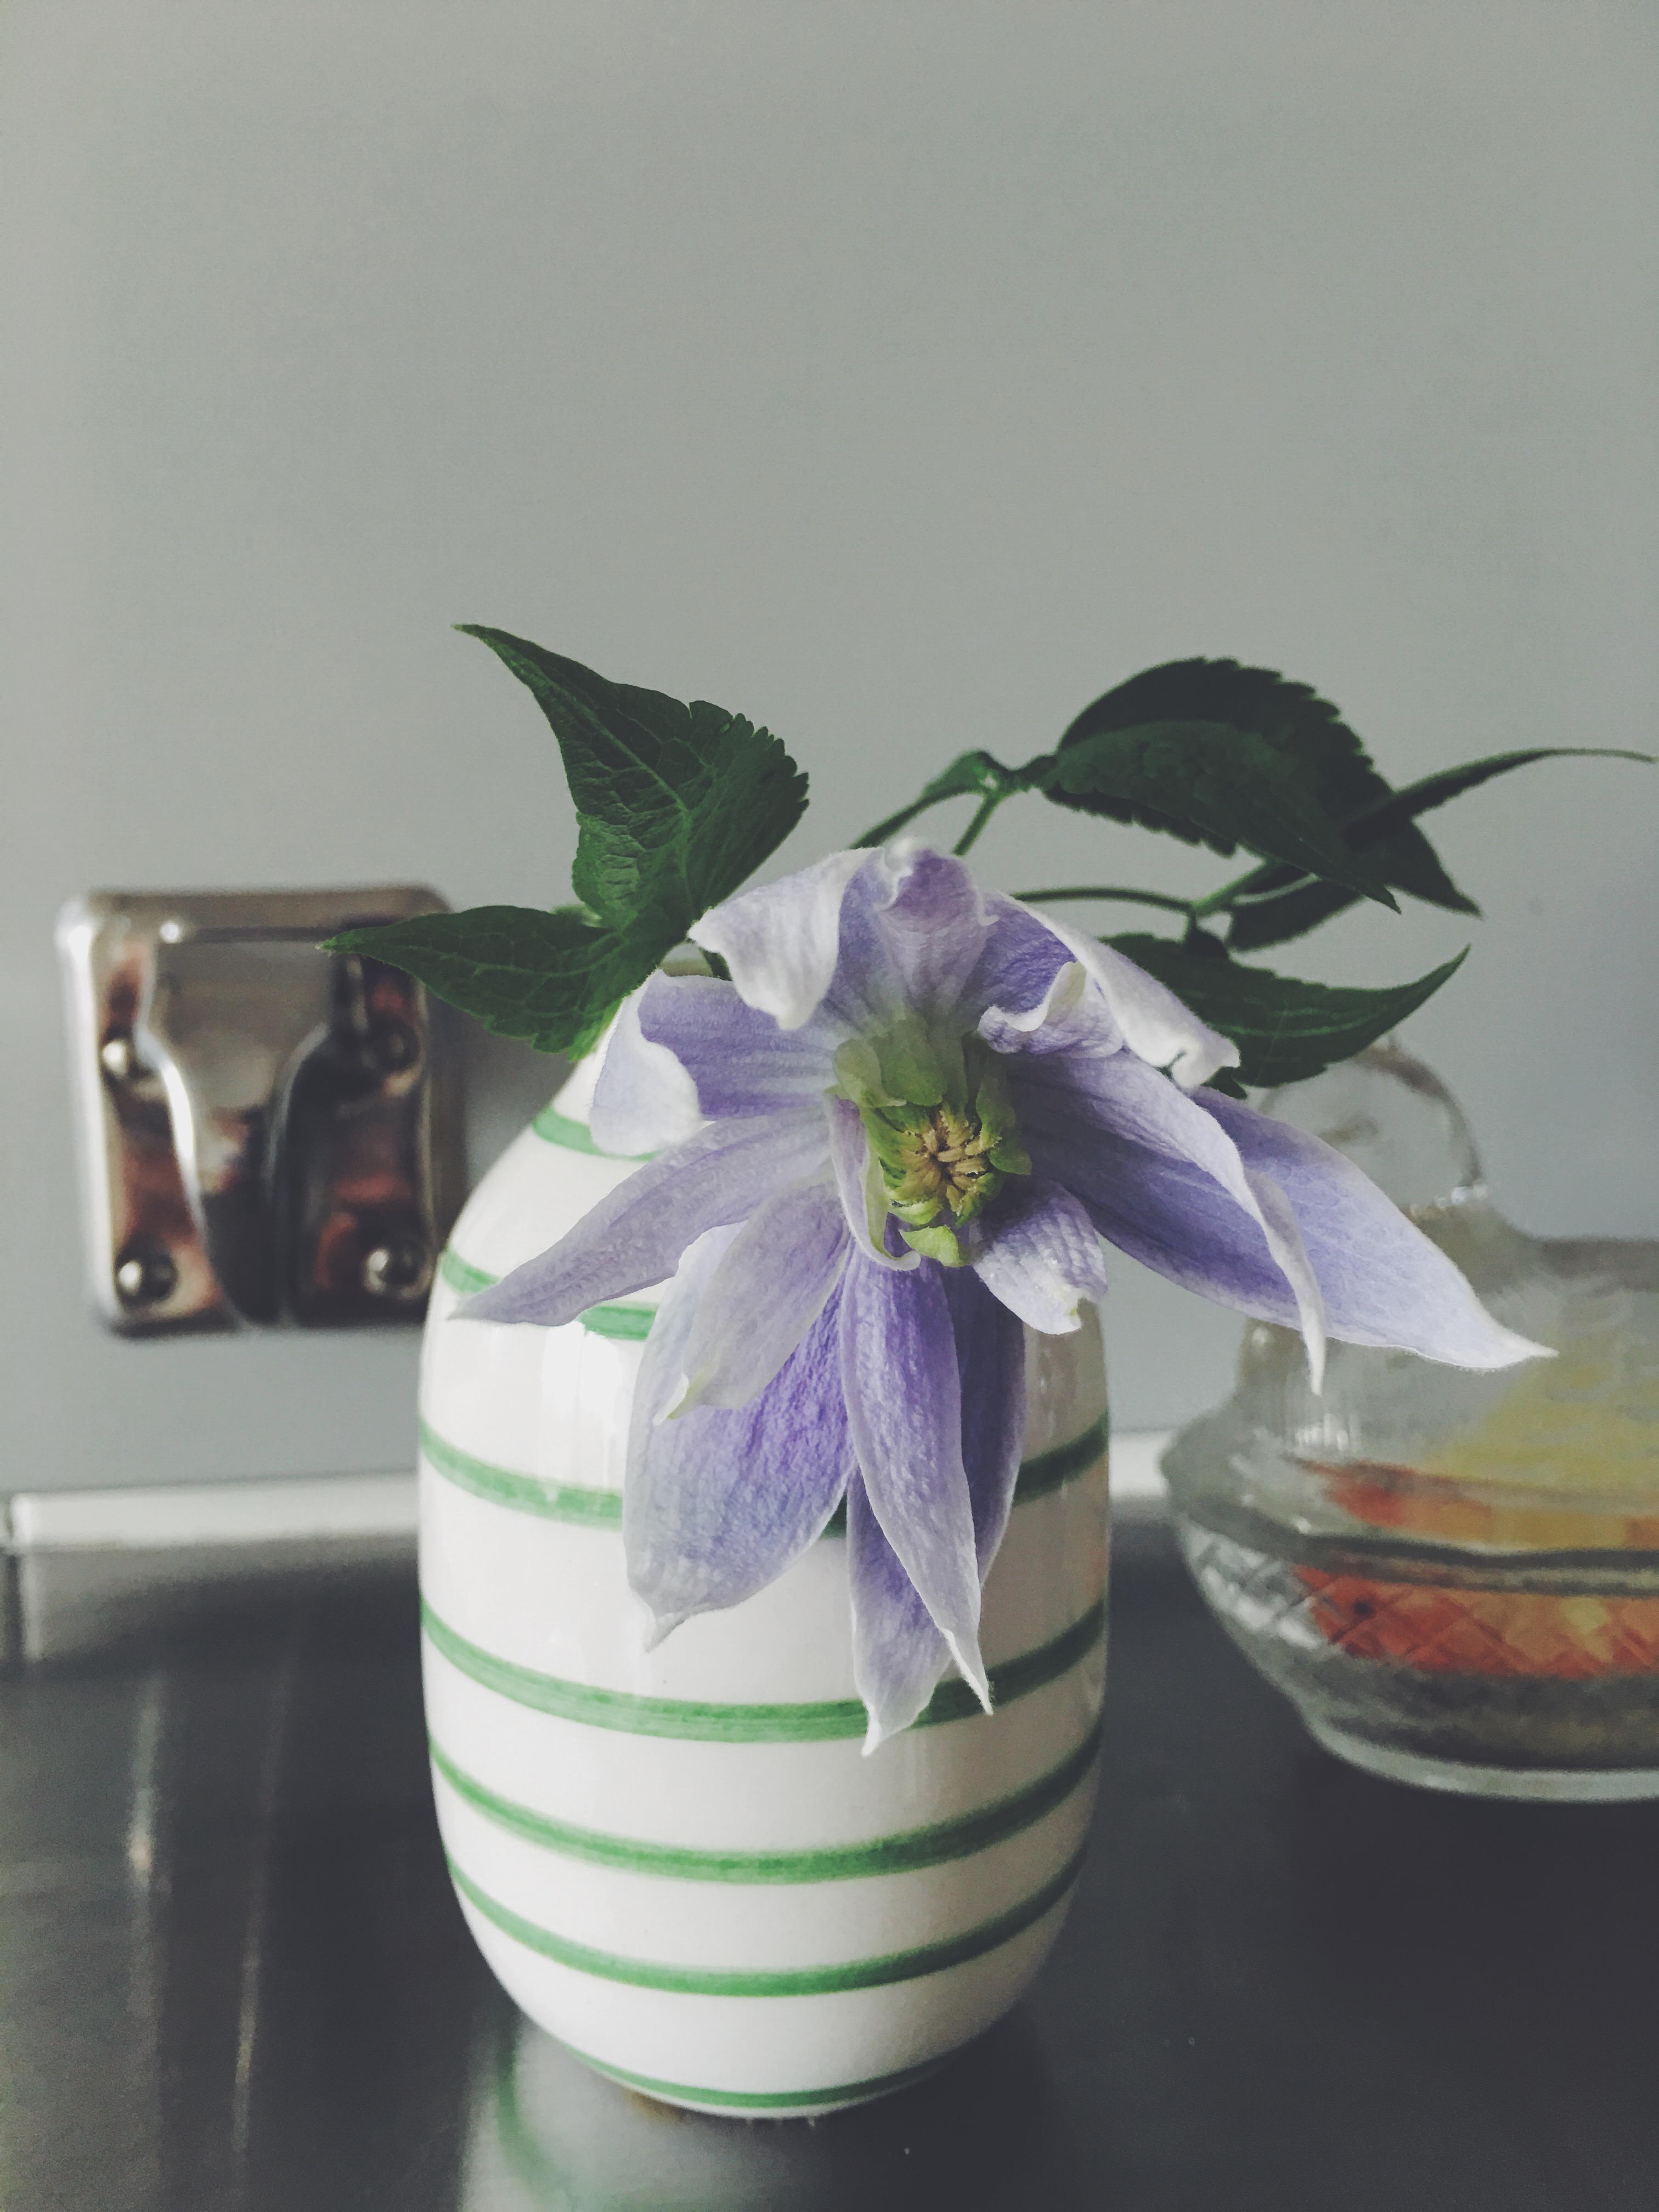 #clematis#flower#blomma#påsk#inredningsblogg#joelhome